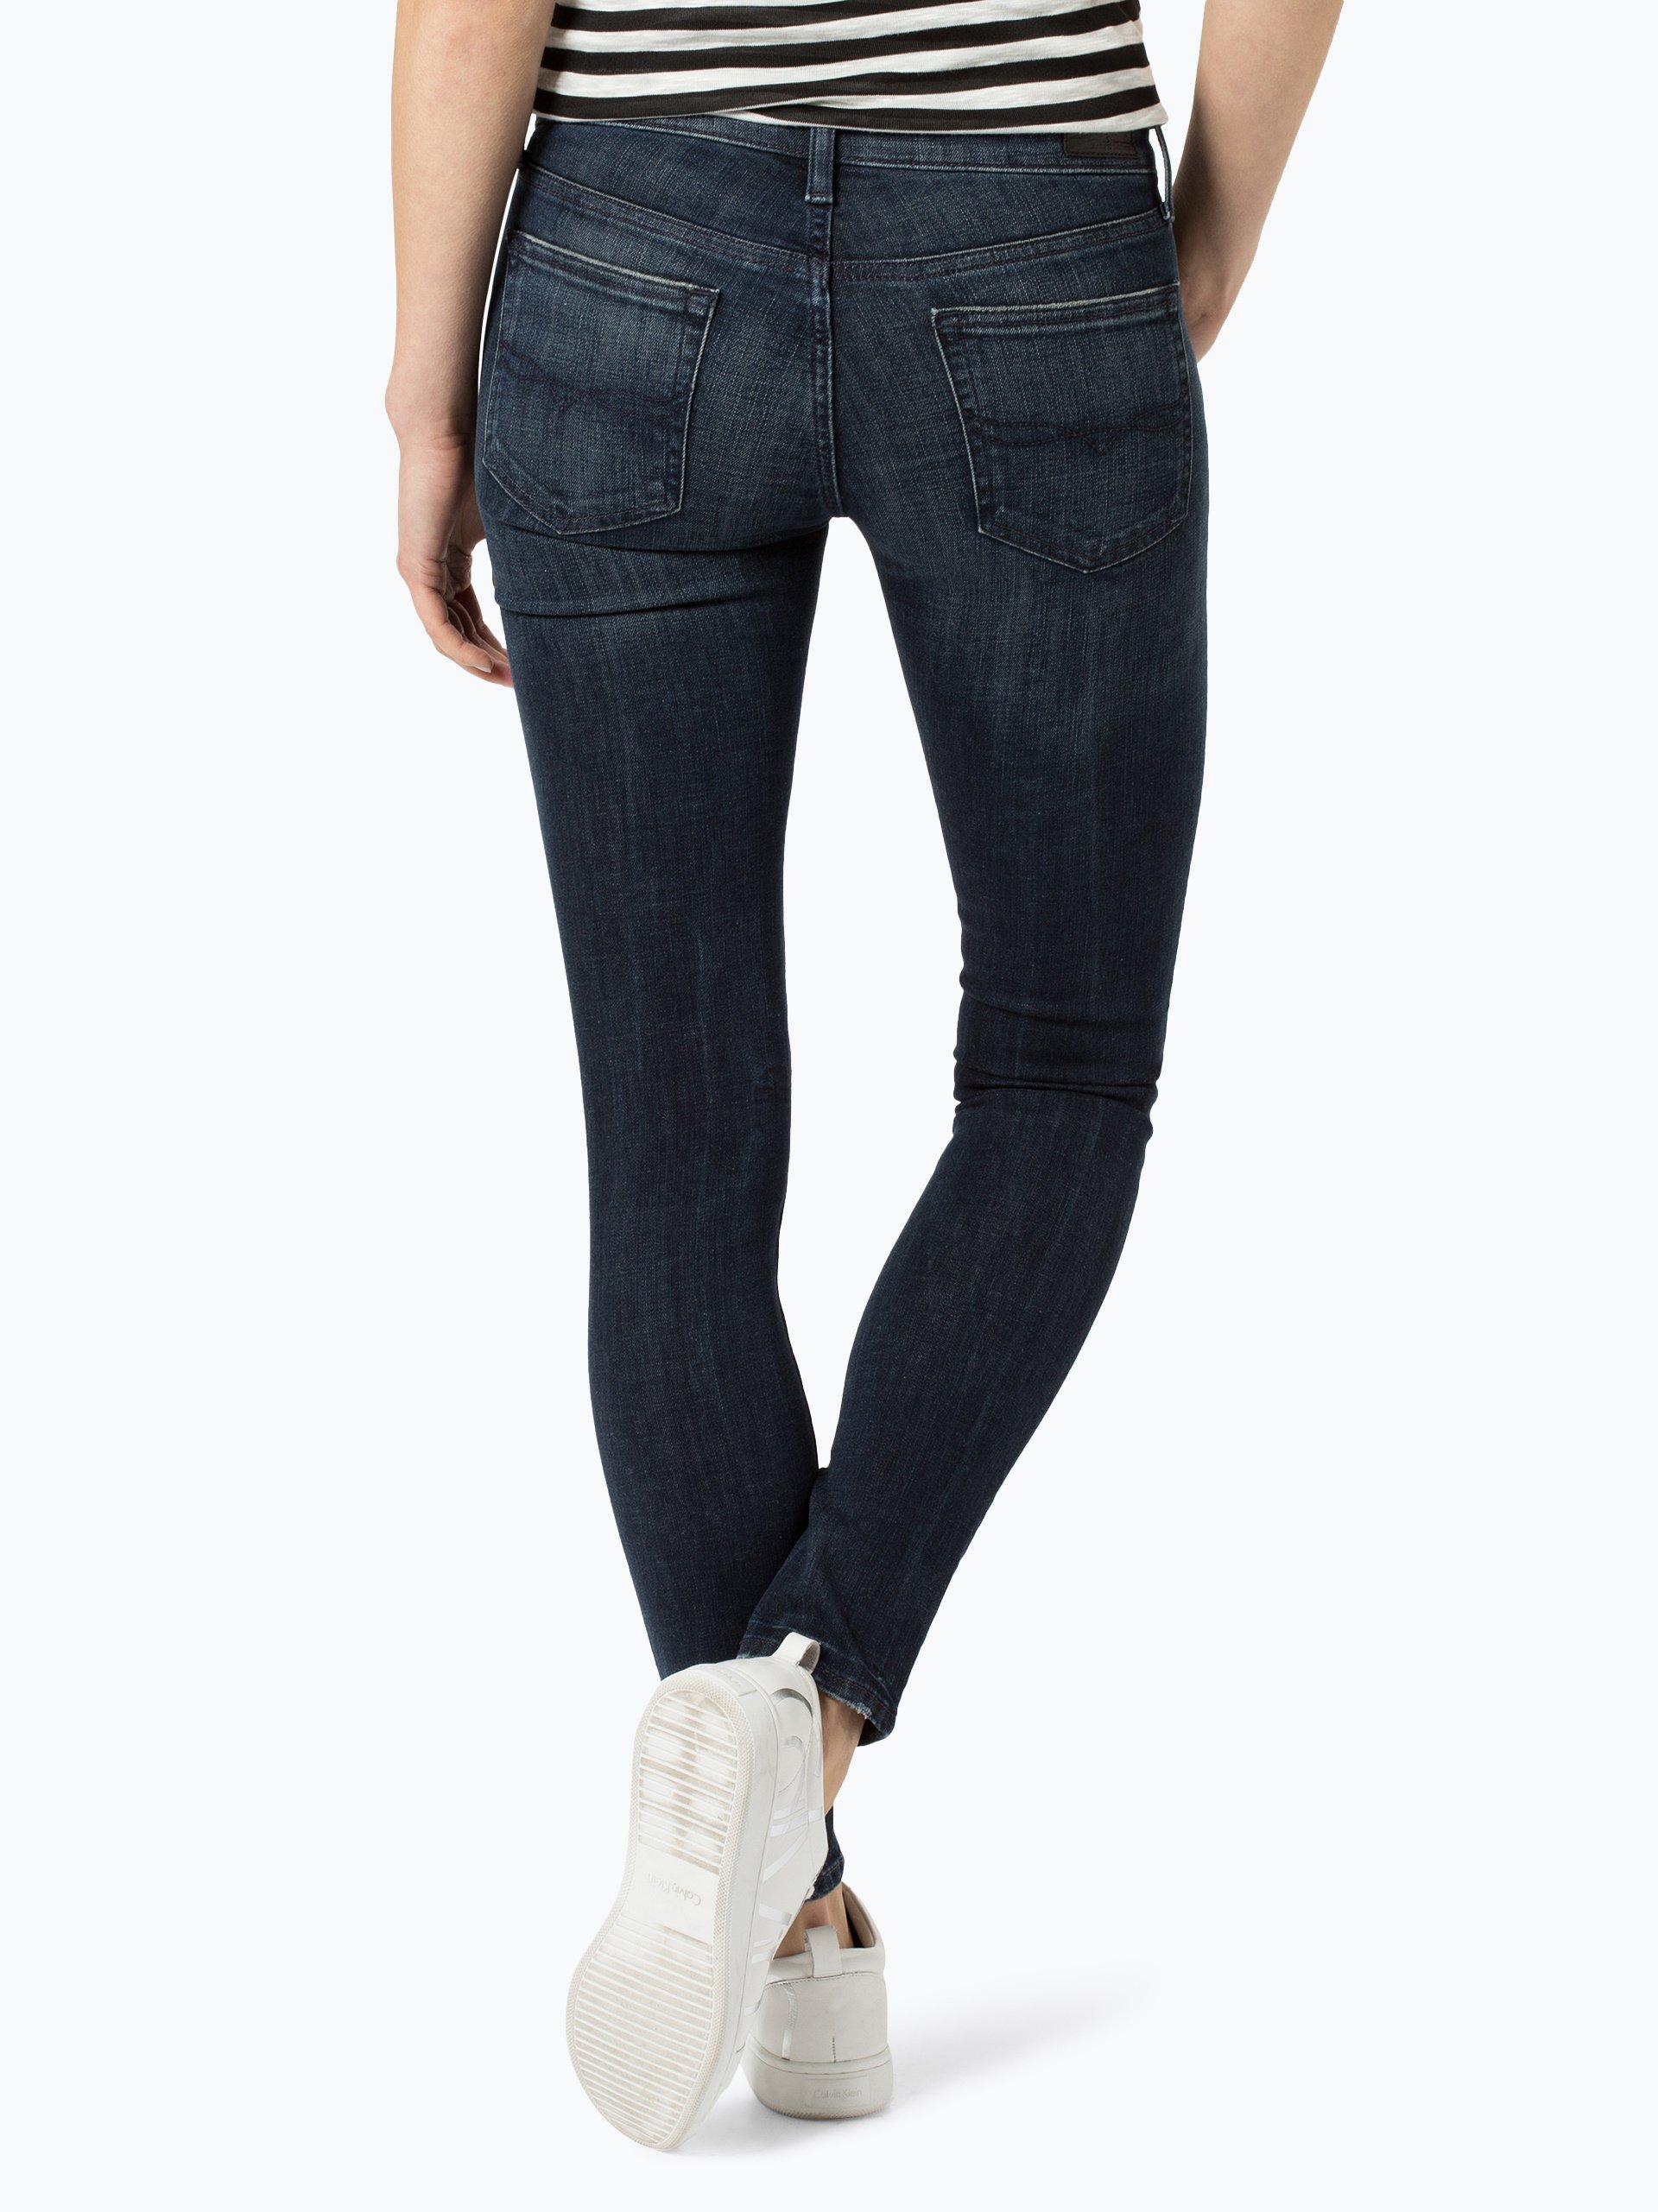 Polo Ralph Lauren Damen Jeans - The Tompkins